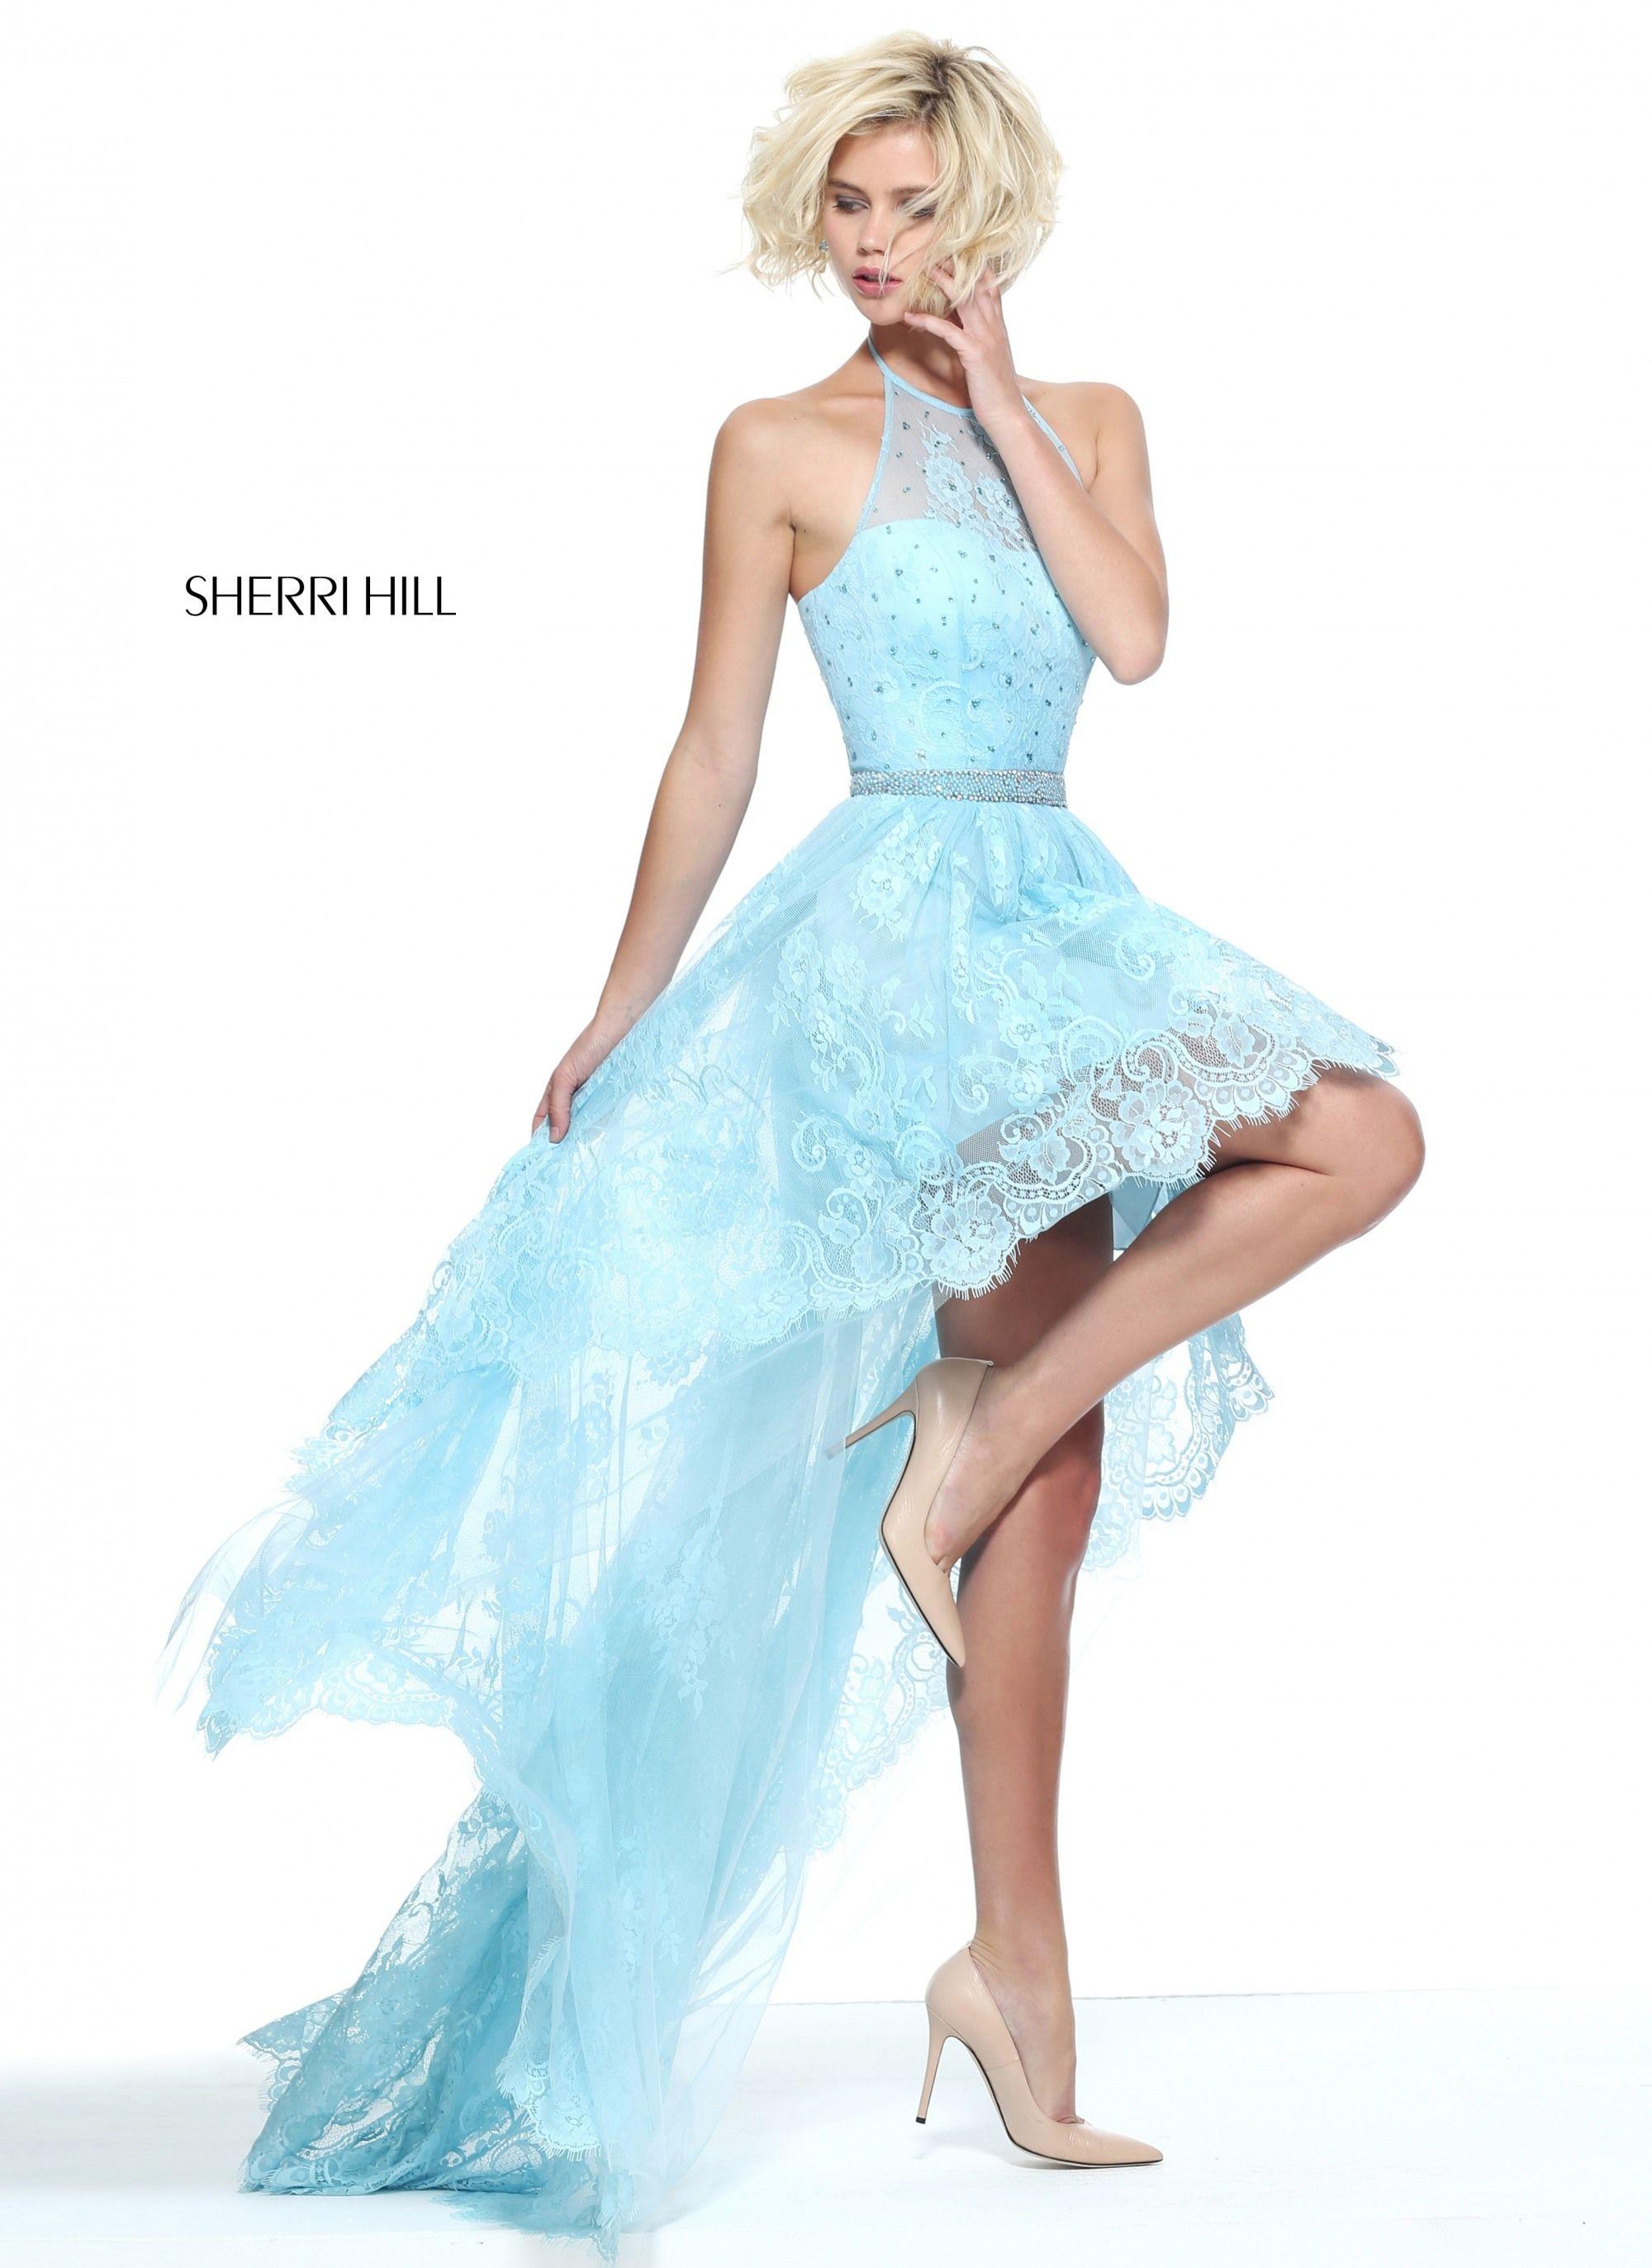 Sherri Hill 51226 | Prom, Sherri hill prom dresses and Fasion